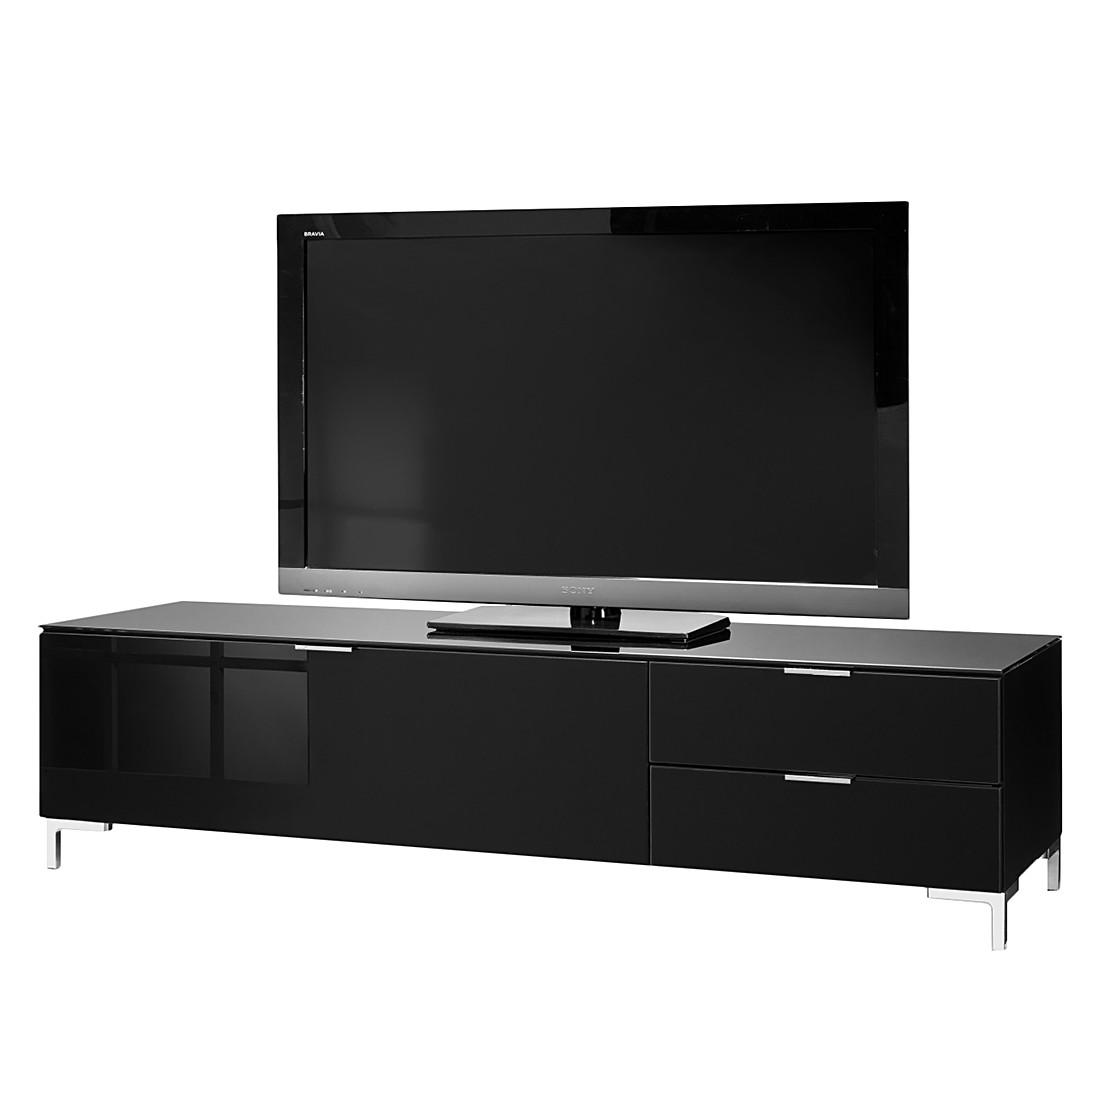 Tv lowboard schwarz glas  TV-Lowboard Cleo II - Weiß/Glas Sand, Cs Schmal | Möbel preiswert ...